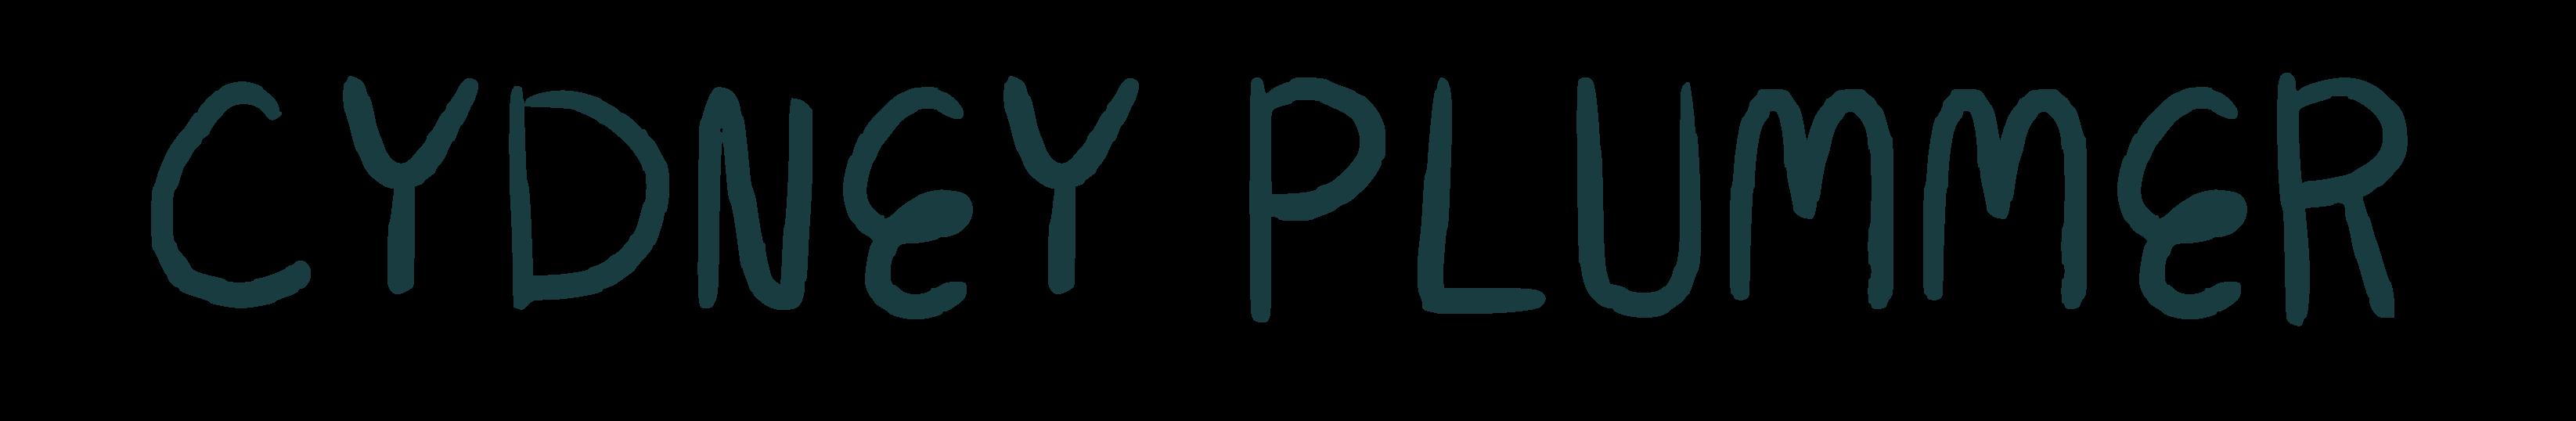 Cydney Plummer